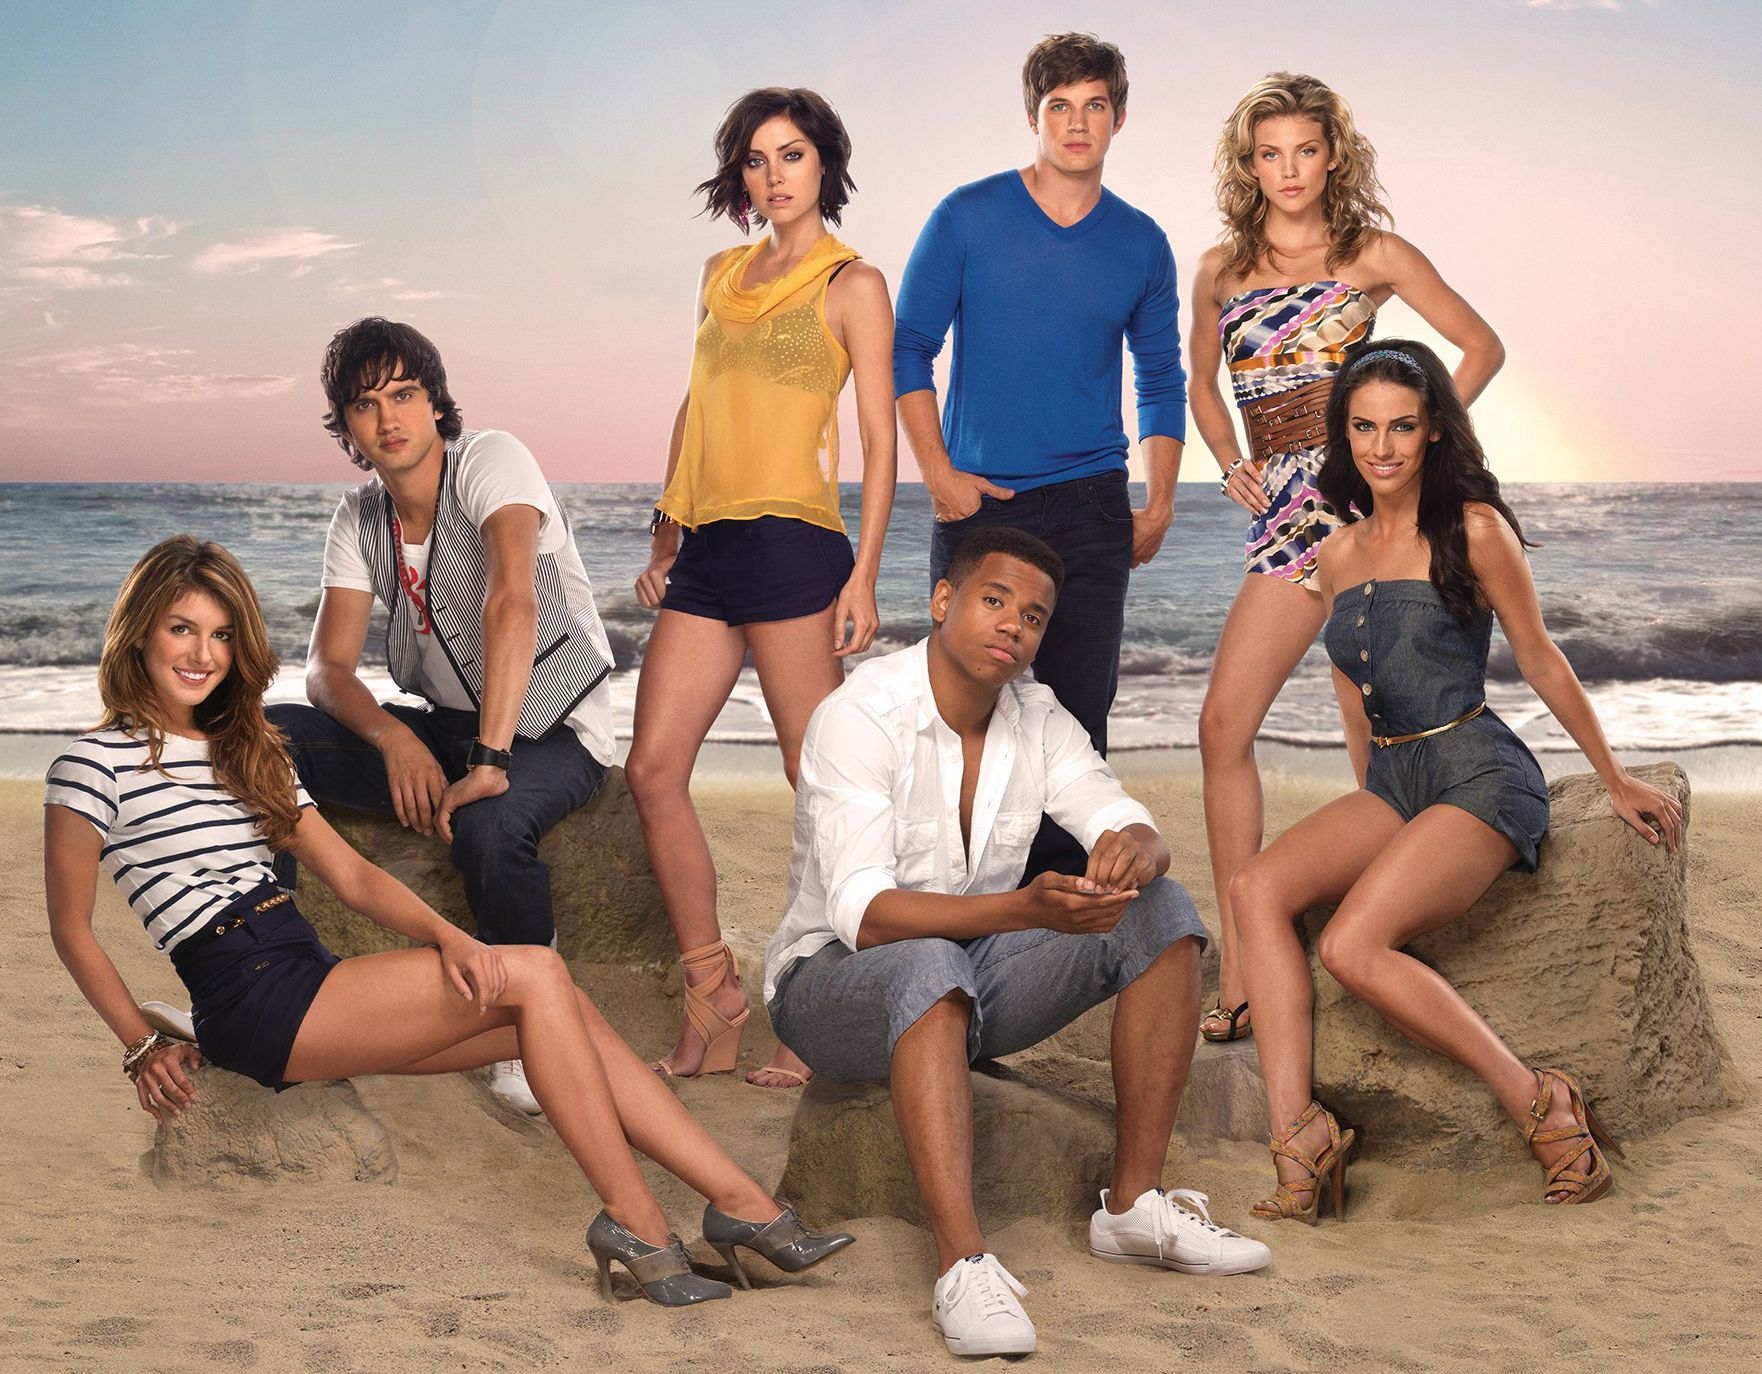 the show 90210 cast -